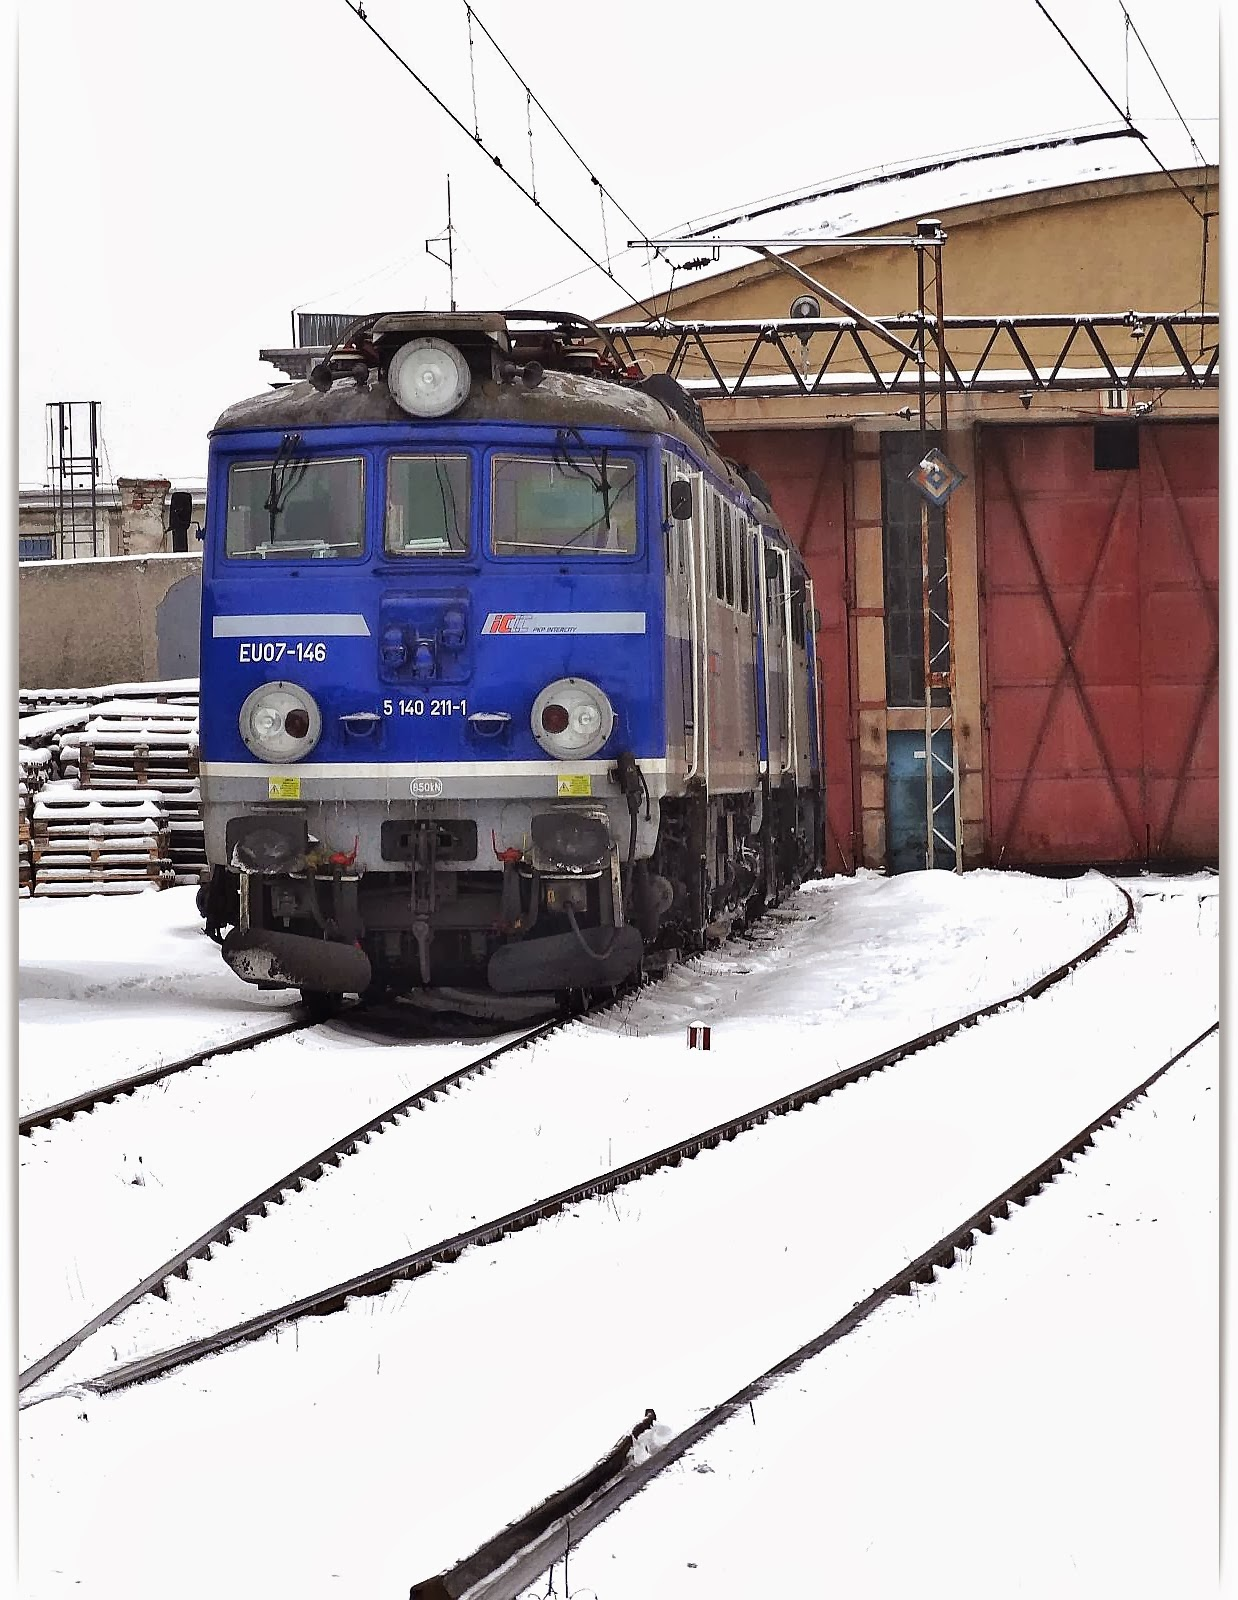 EU07-146